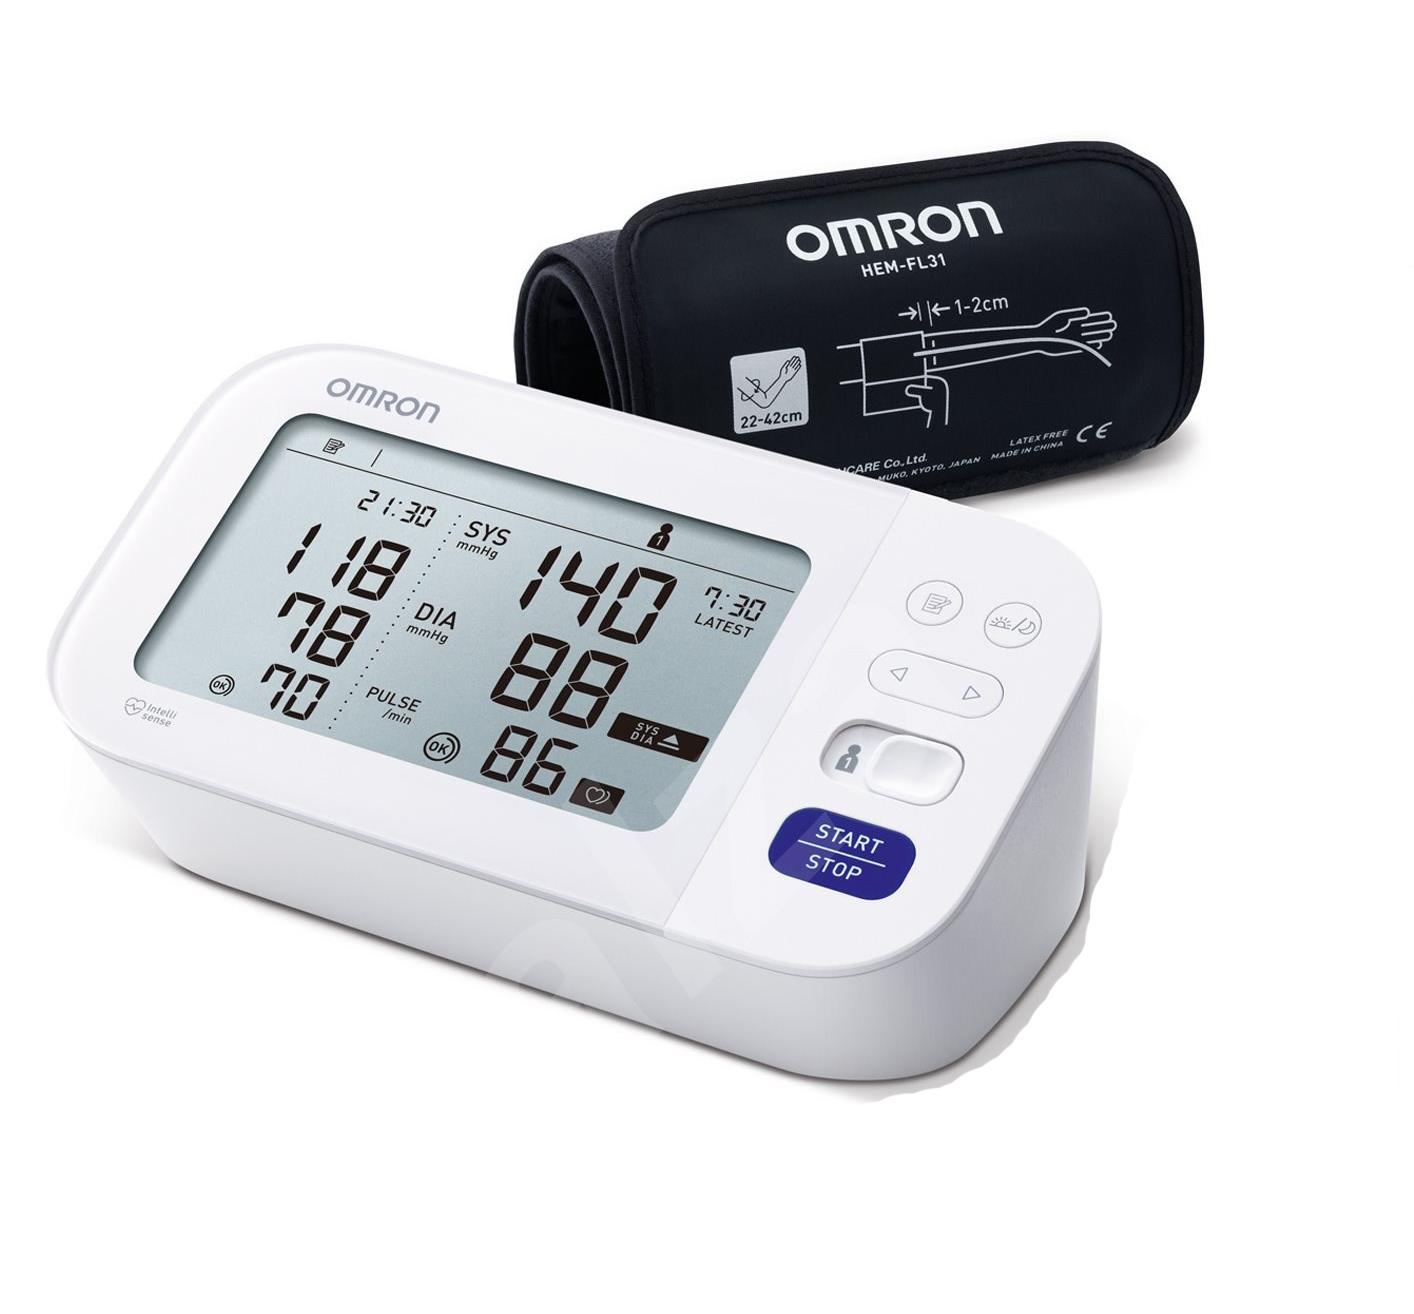 Omron Blood Pressure Monitor M6 COMFORT (HEM-7360-E)